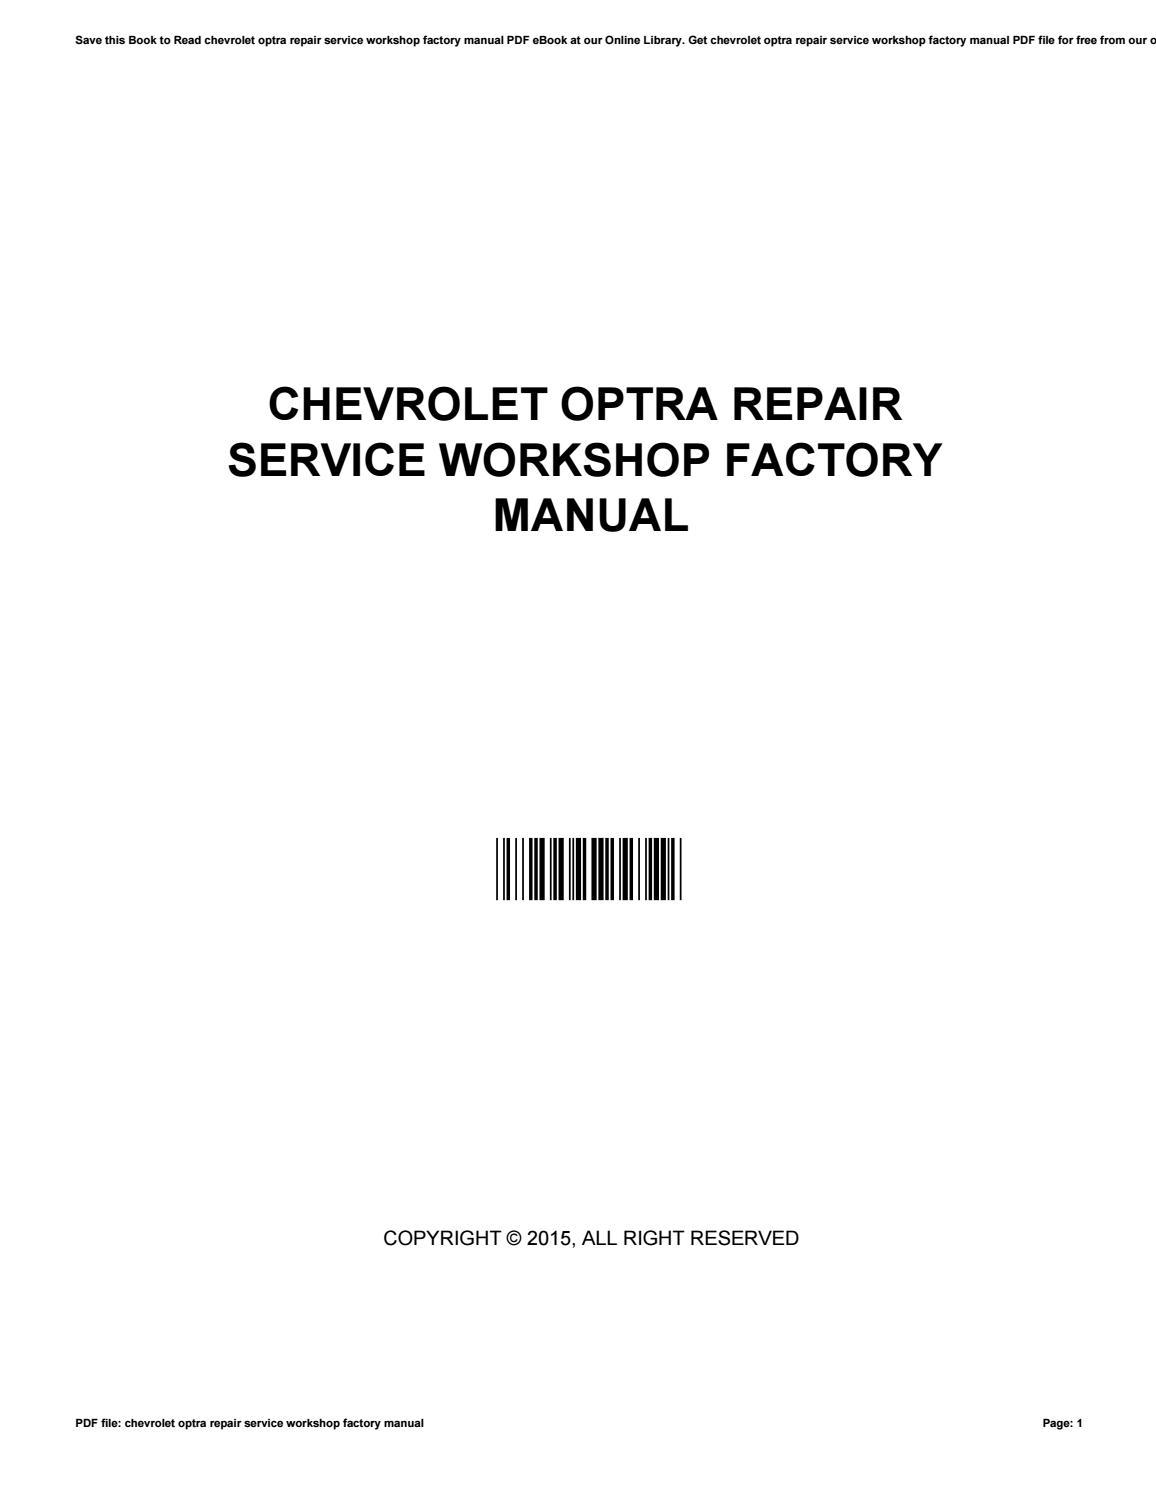 Chevrolet optra repair service workshop factory manual by MeganMorin2246 -  issuu